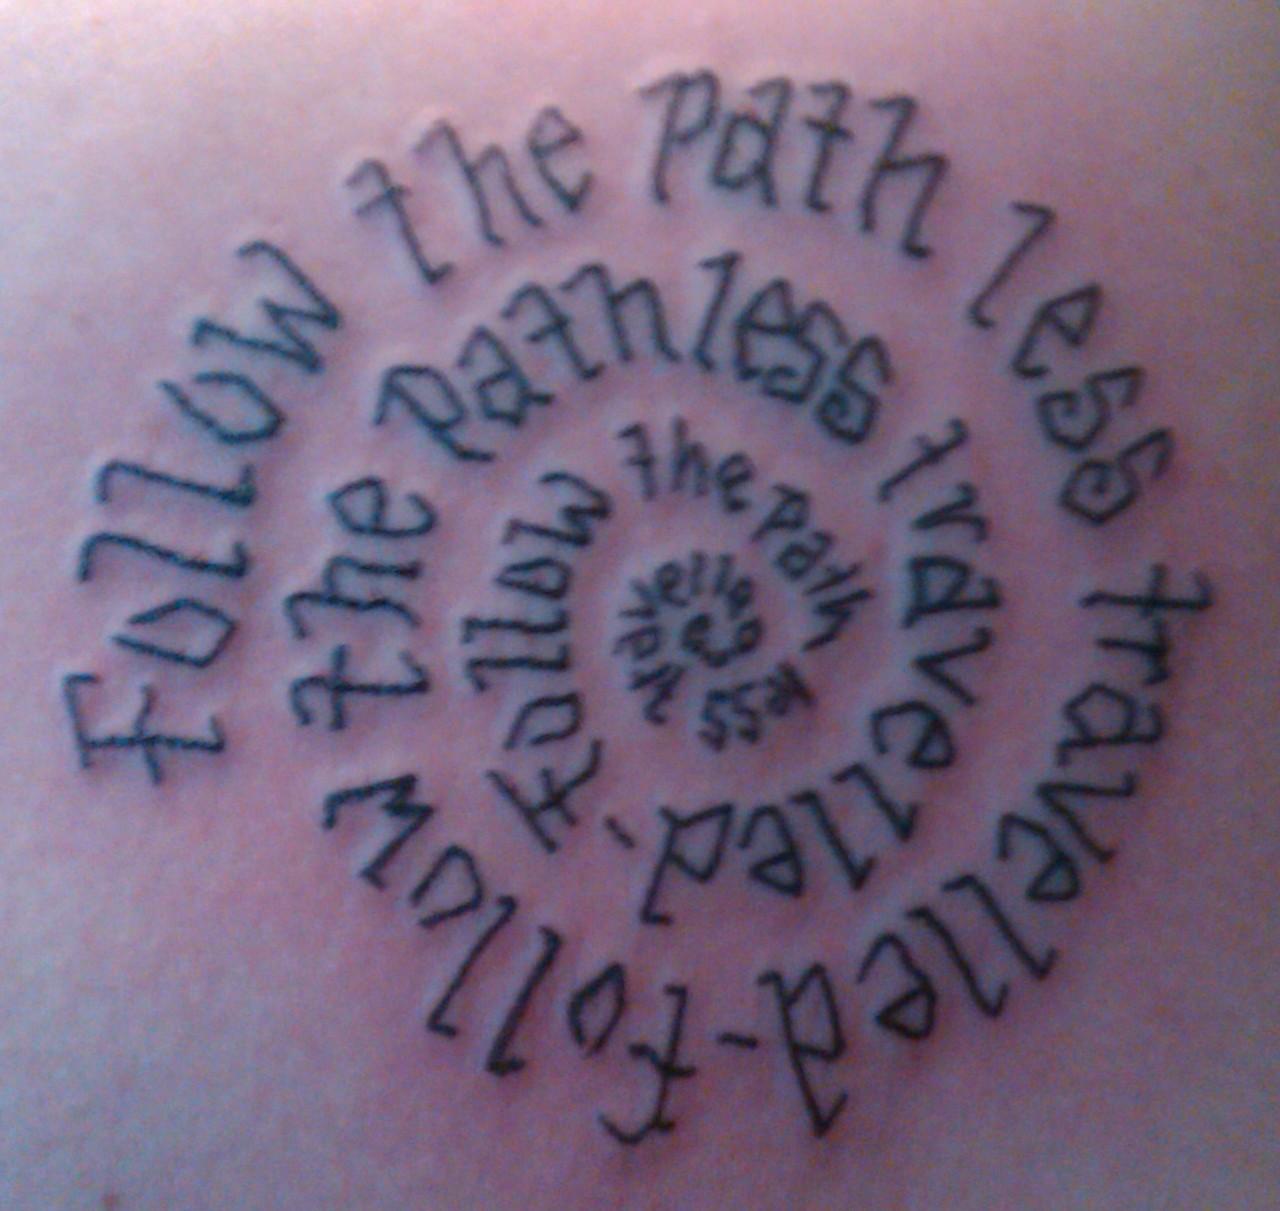 http://3.bp.blogspot.com/-Lsin_OYUSOI/Ta-ecV4h45I/AAAAAAAAAMg/zGL0_Gd7a0c/s1600/tattoo.jpg